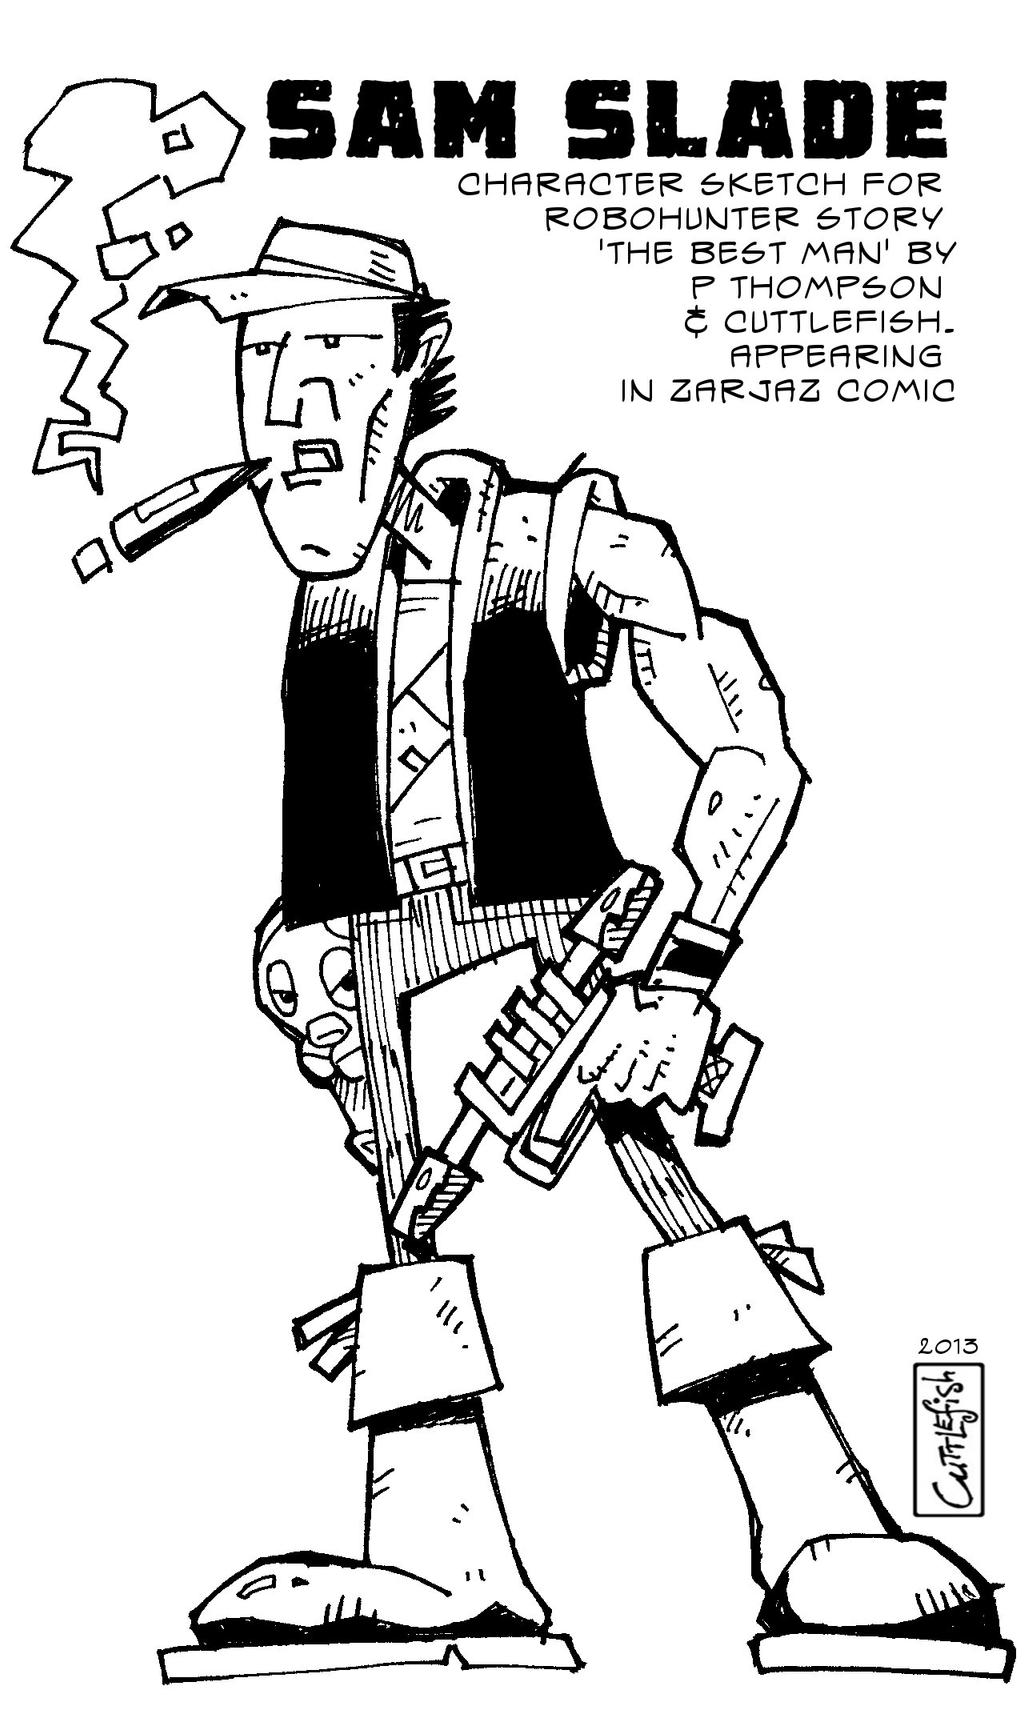 Sam Slade Robohunter Sketch